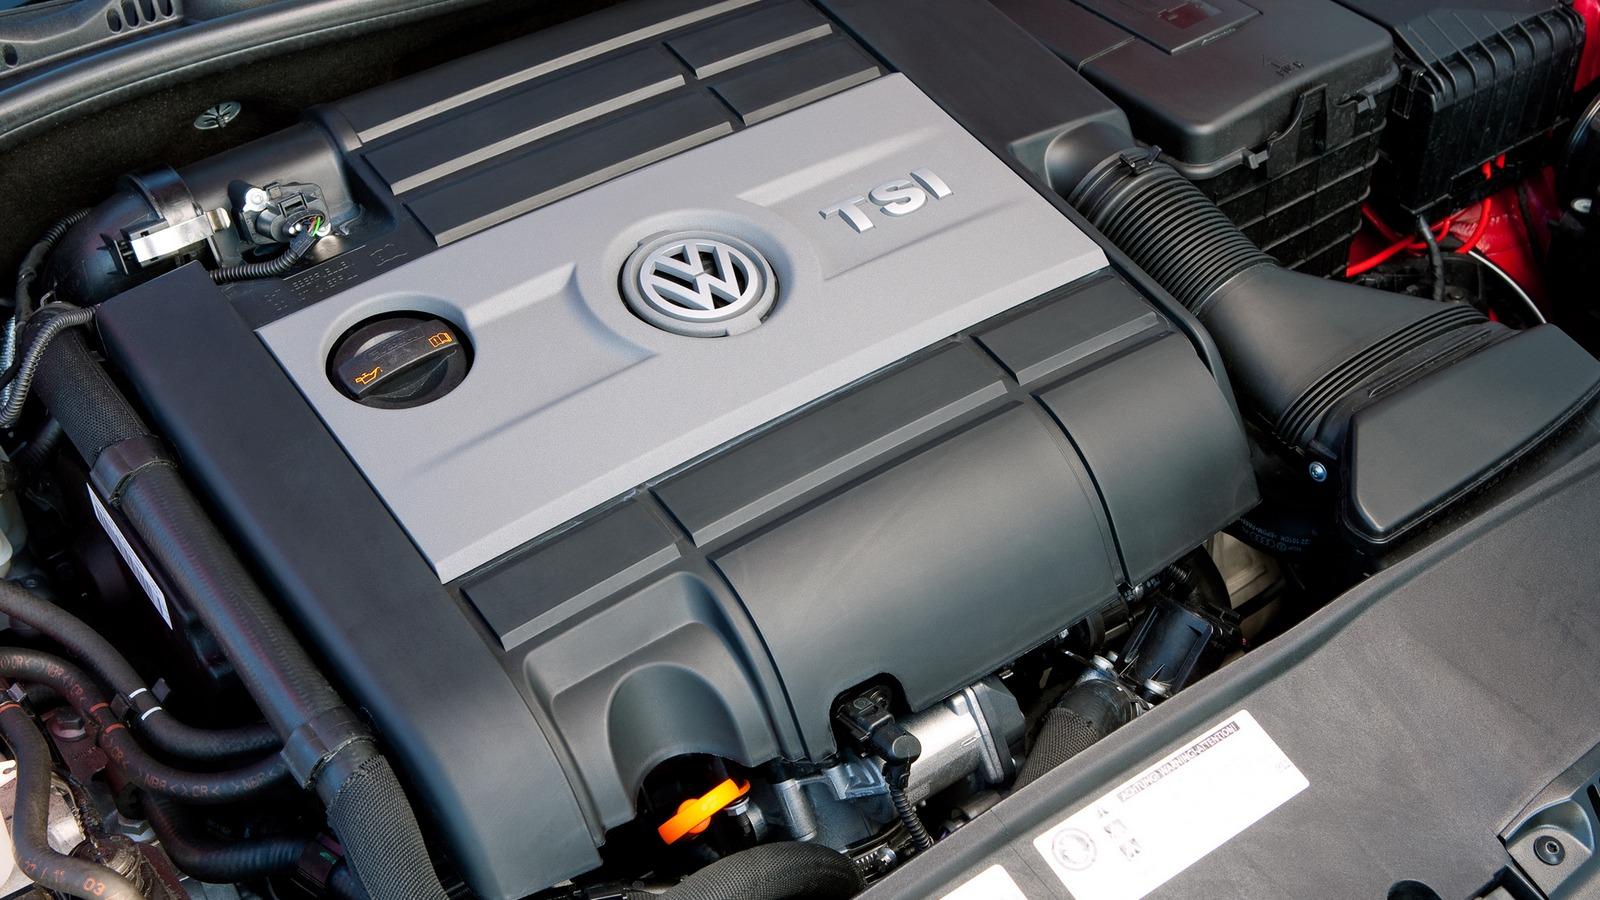 моторы tfsi 1,4 audi отзыв